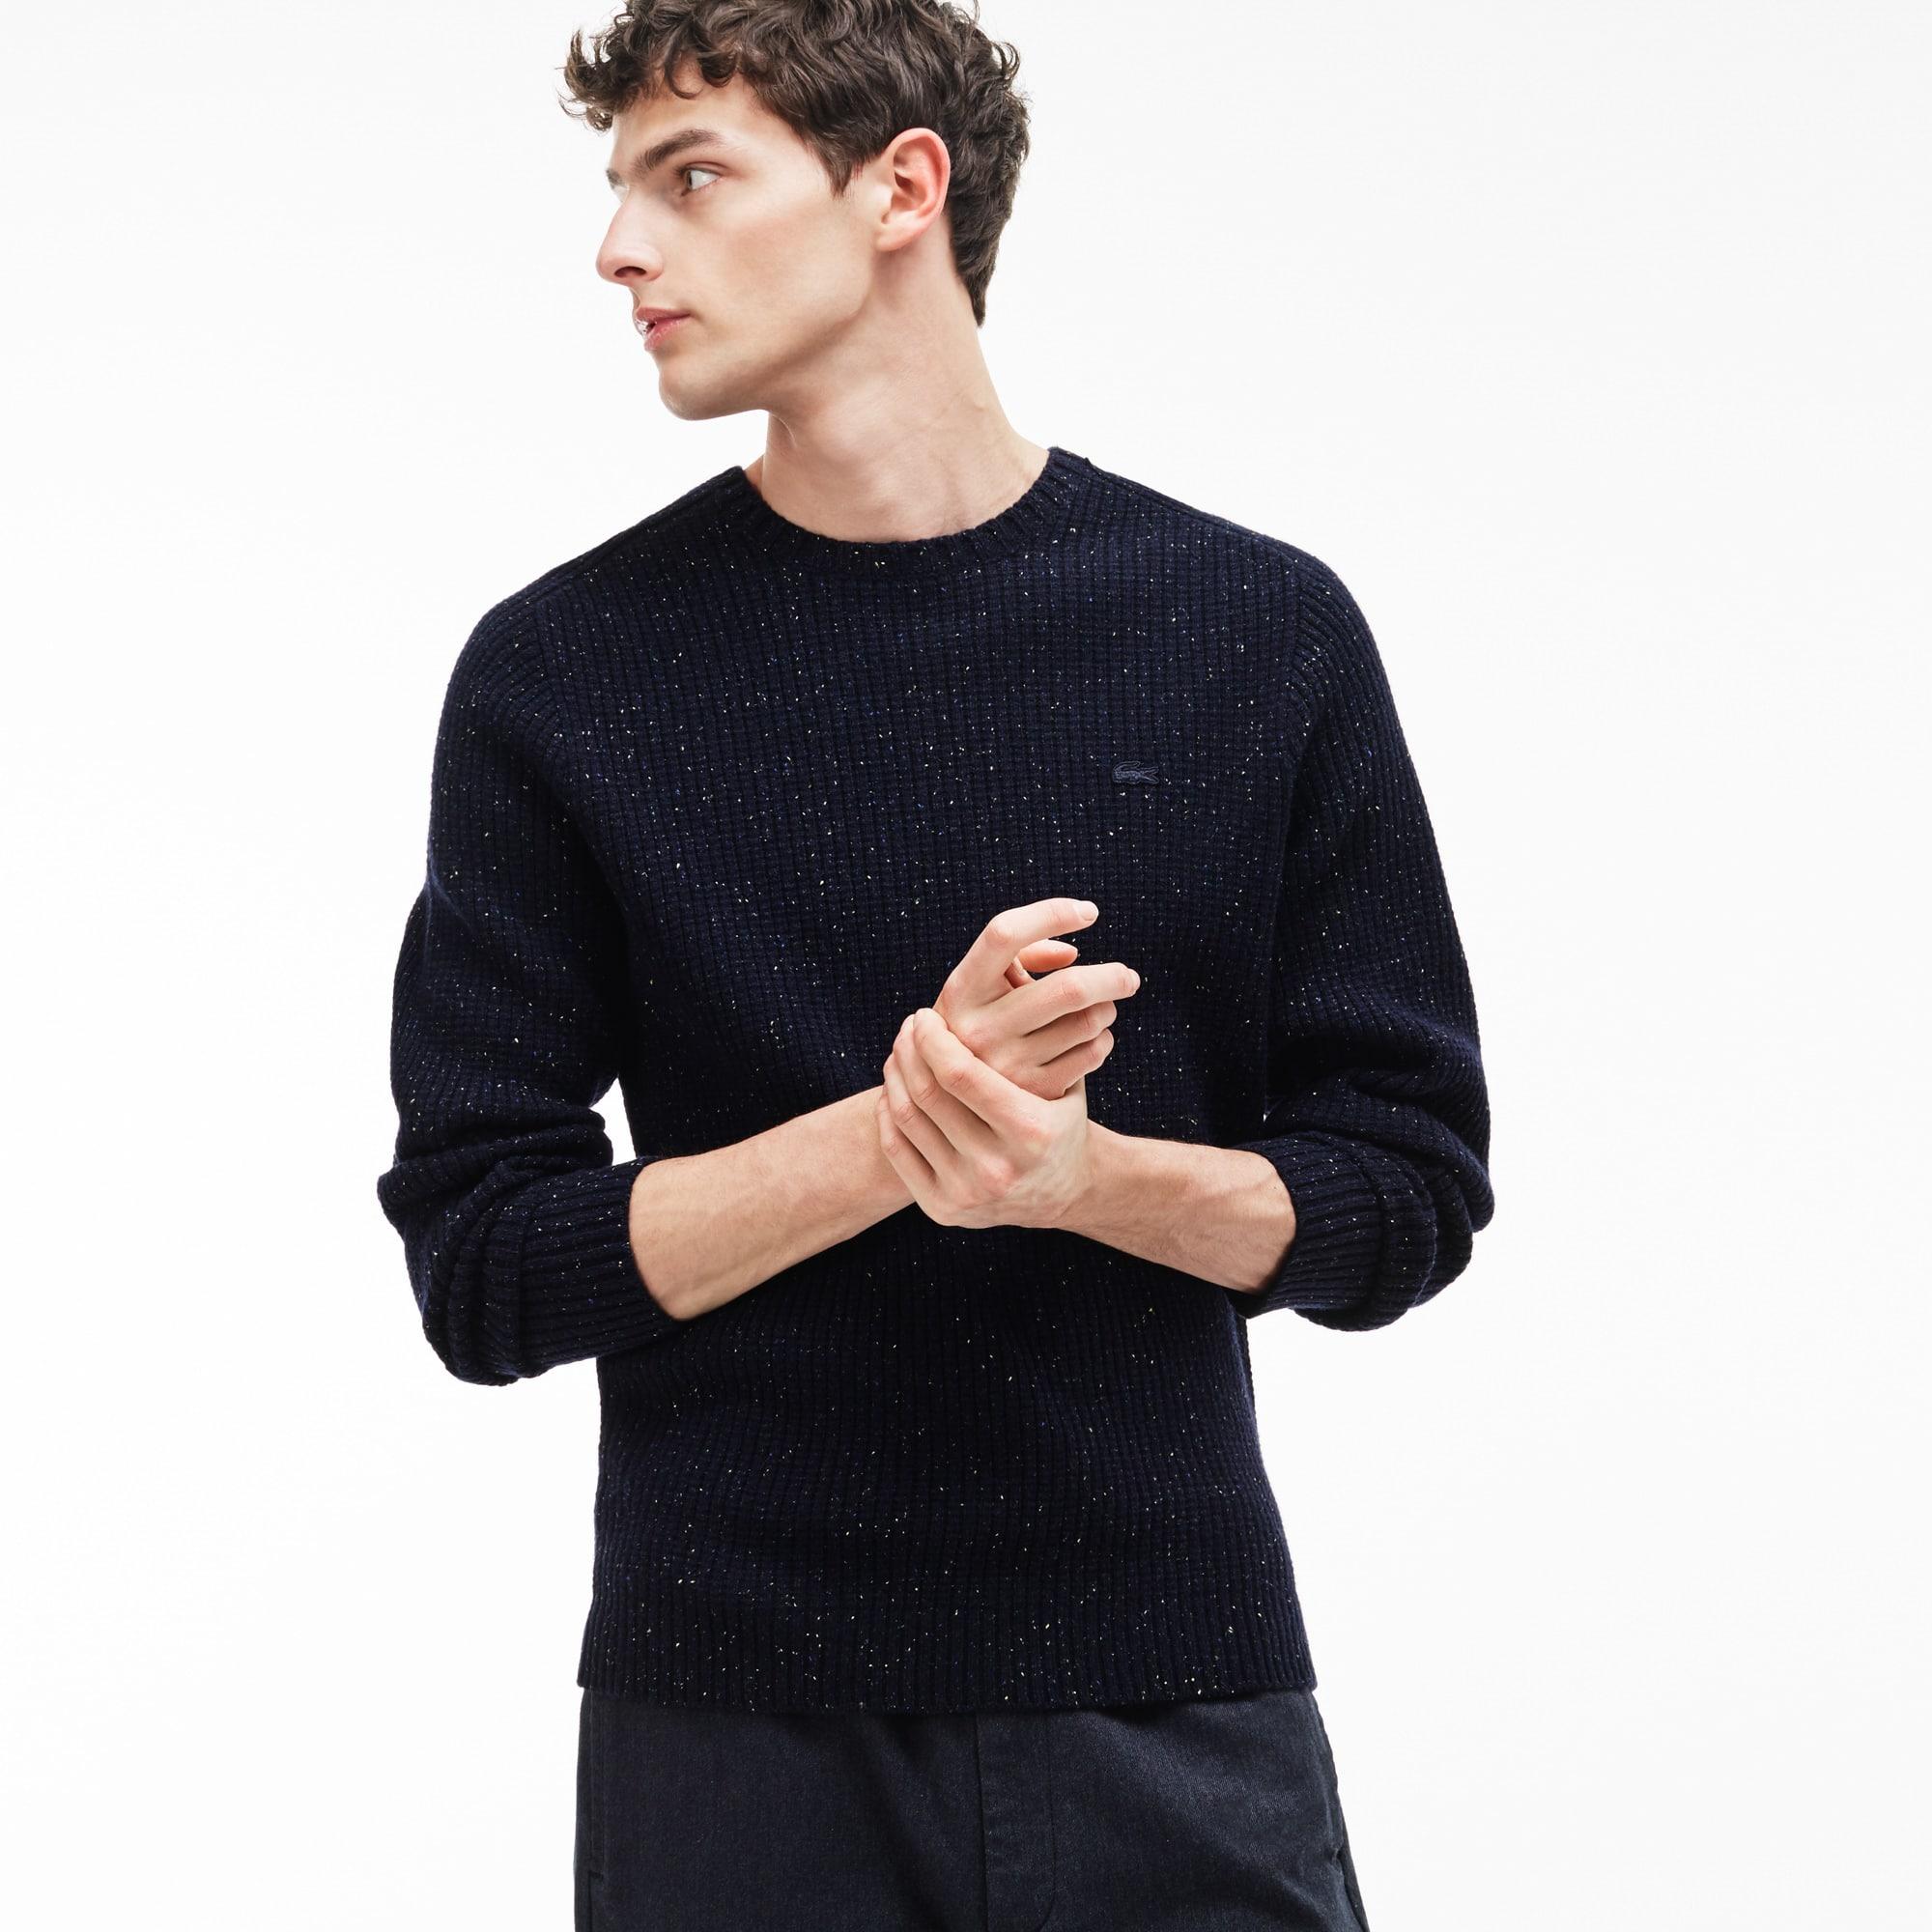 Men's Crew Neck Two-Tone Polka Dot Waffle Stitch Wool Sweater